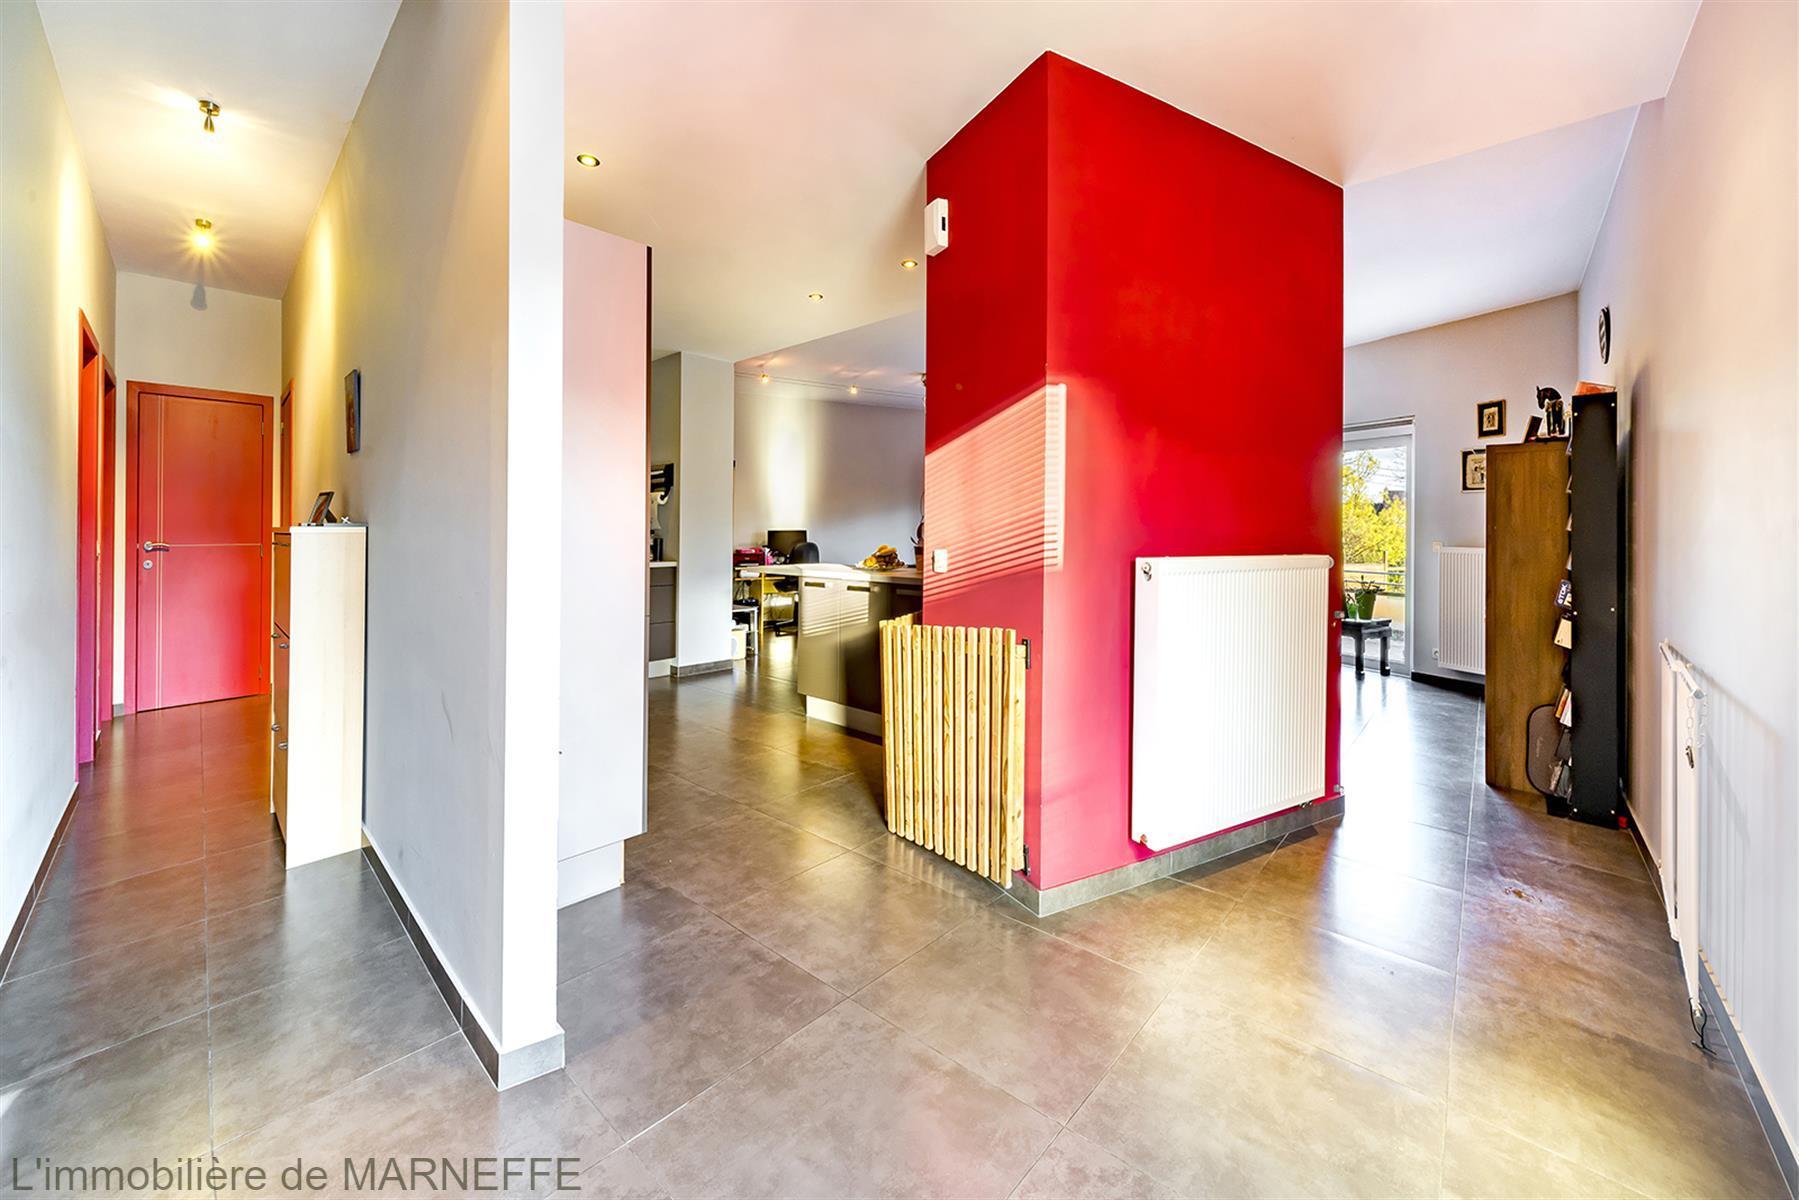 Appartement avec jardin - Orp-Jauche - #3625402-8